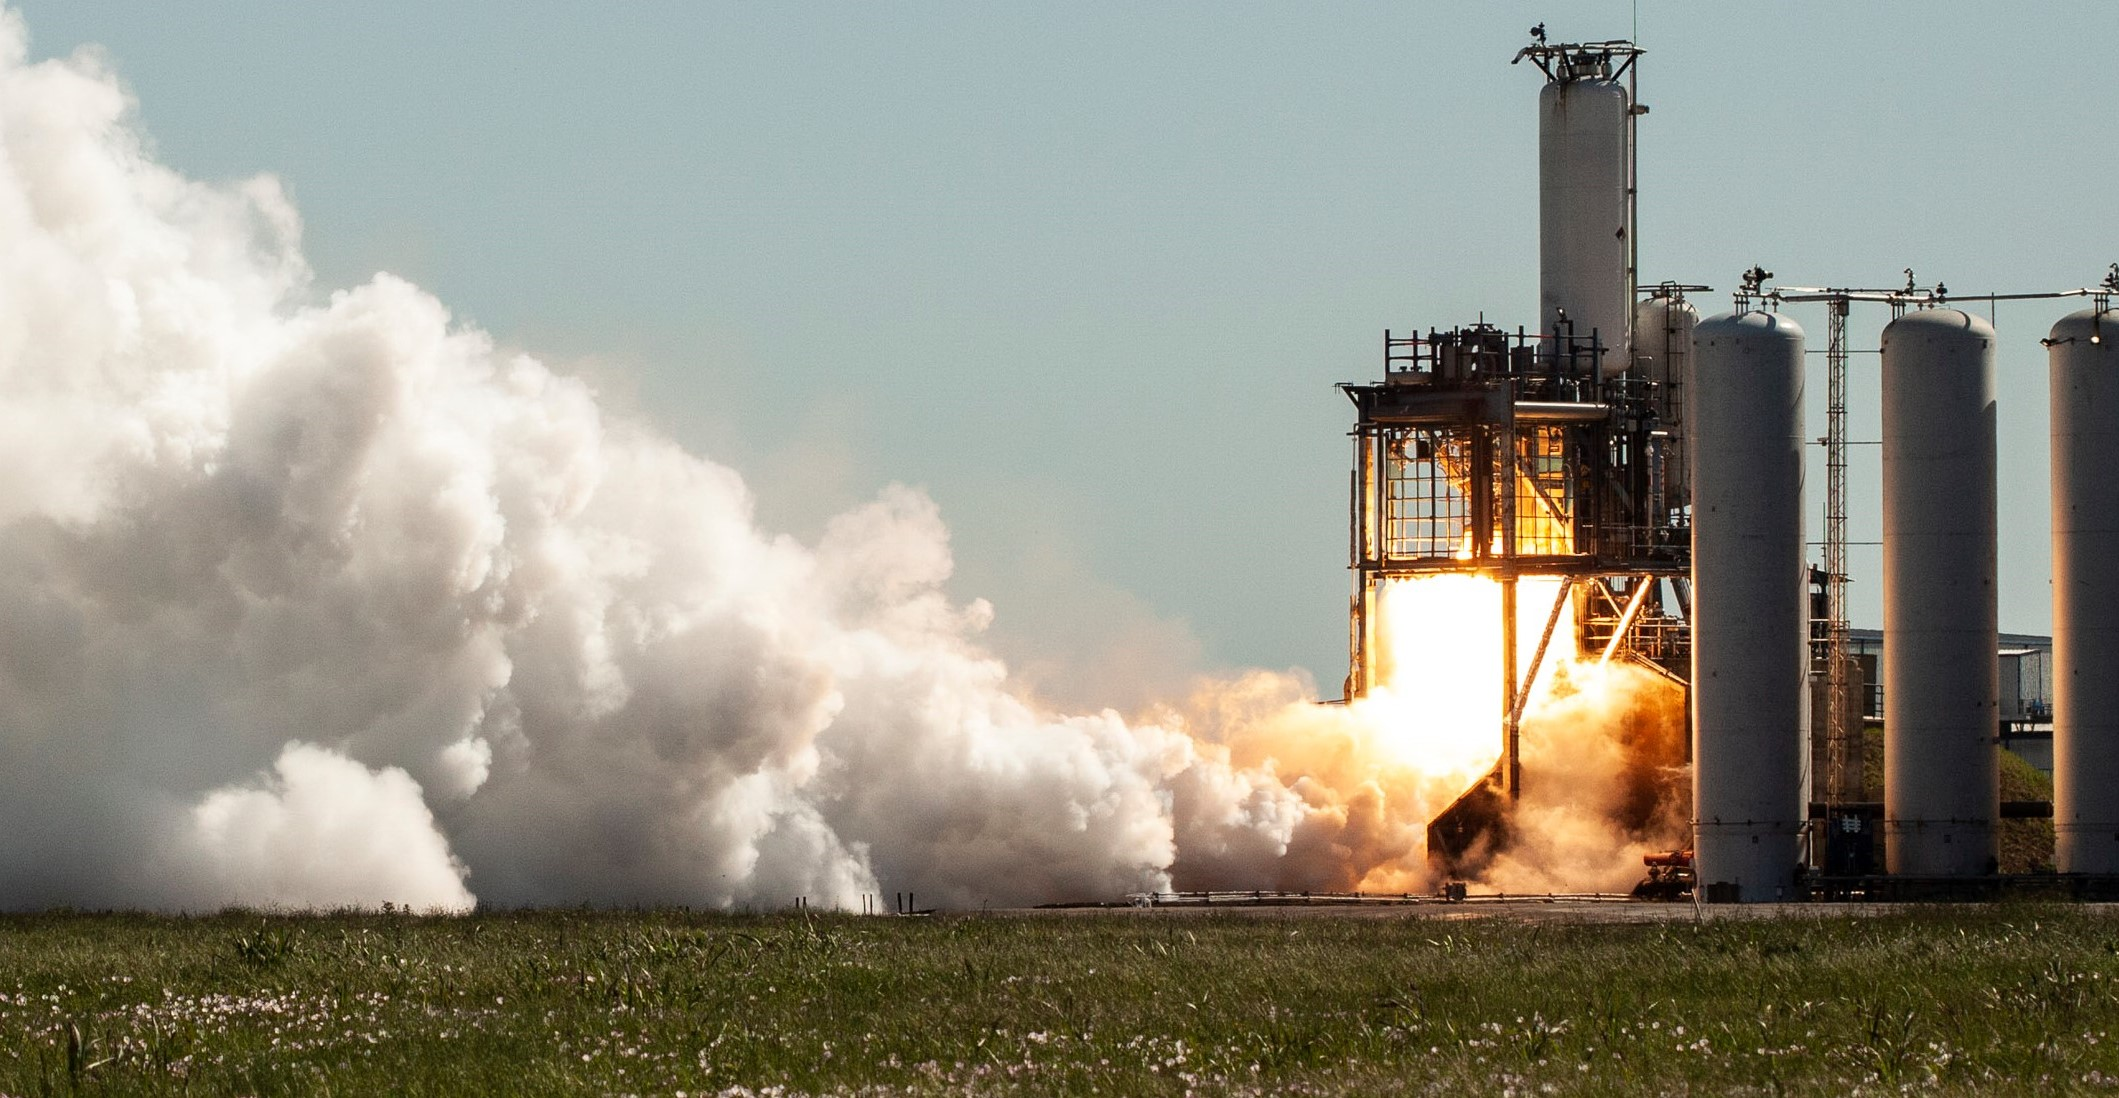 Crew-1 Falcon 9 S2 MVac static fire April 2020 (SpaceX) 1 crop 2